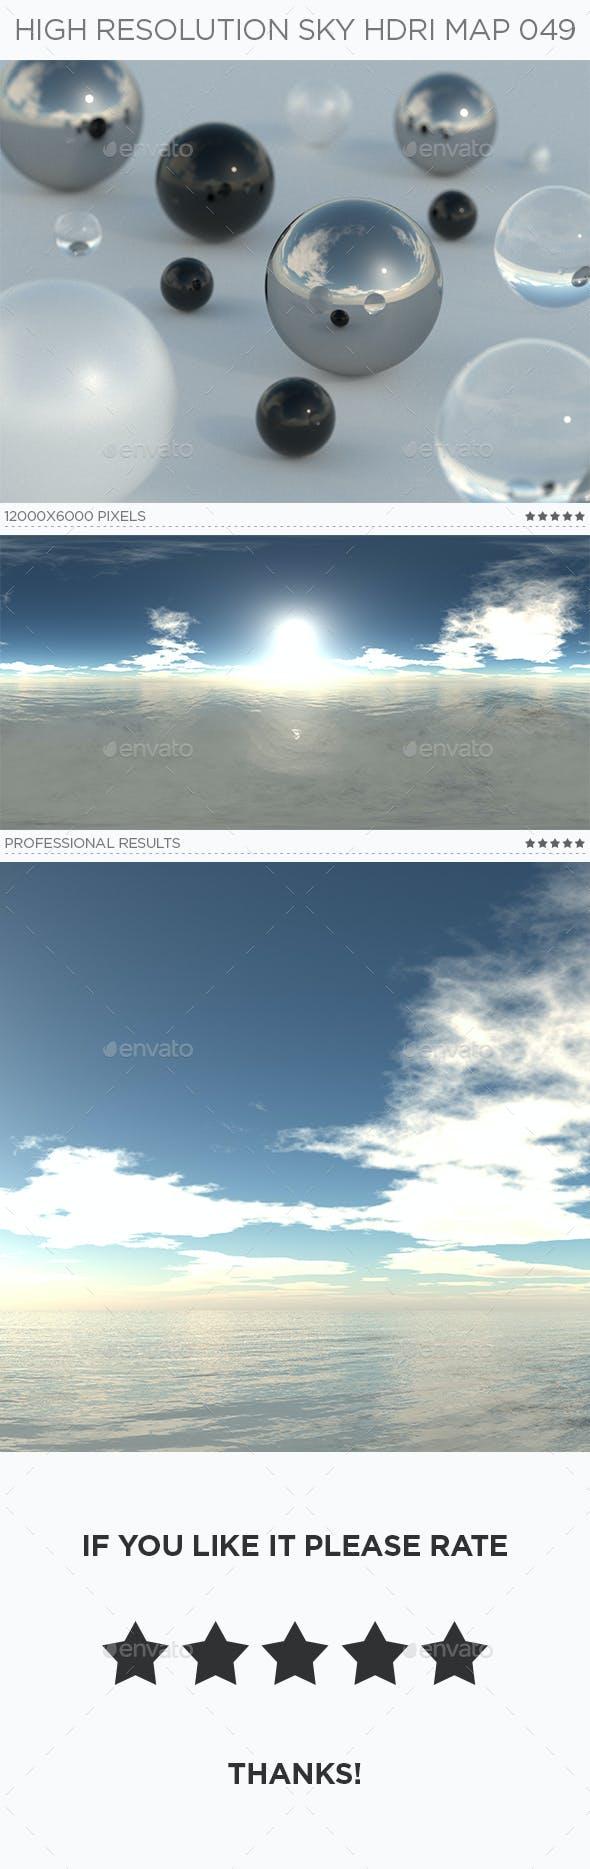 High Resolution Sky HDRi Map 049 - 3DOcean Item for Sale